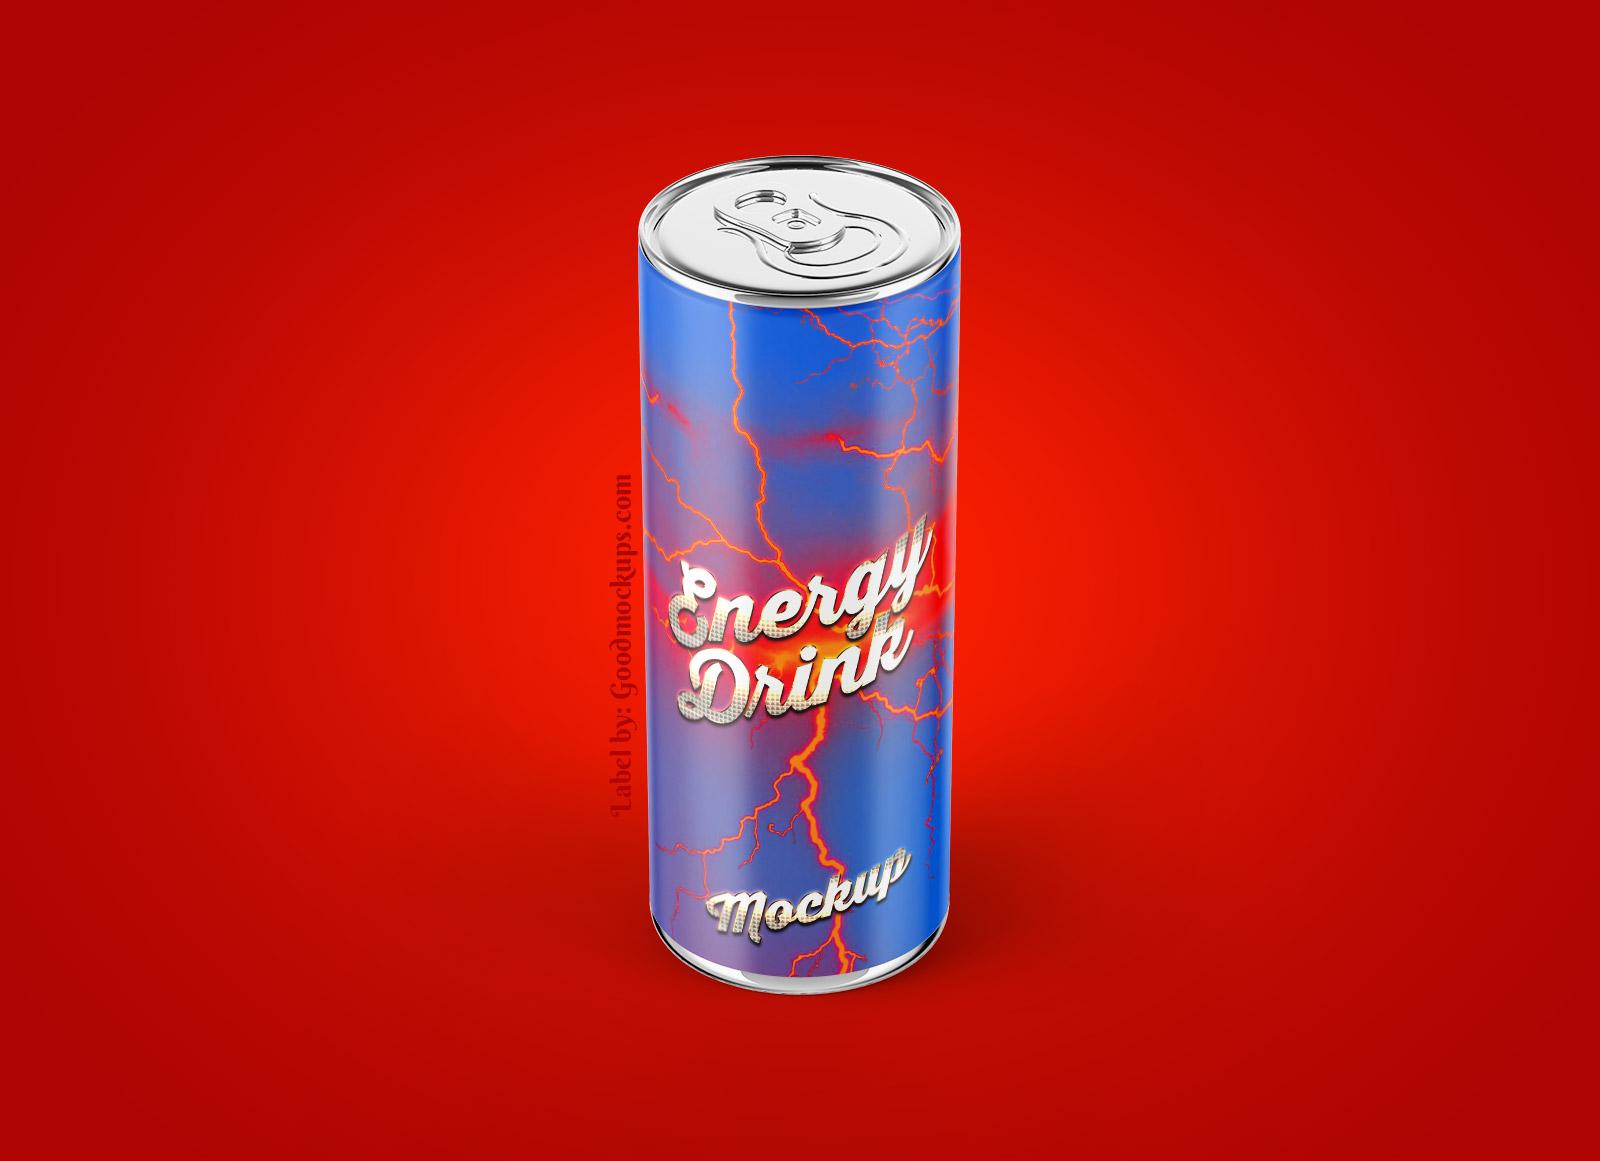 Free-Tin-Can-Energy-Drink-Mockup-PSD-Set-4